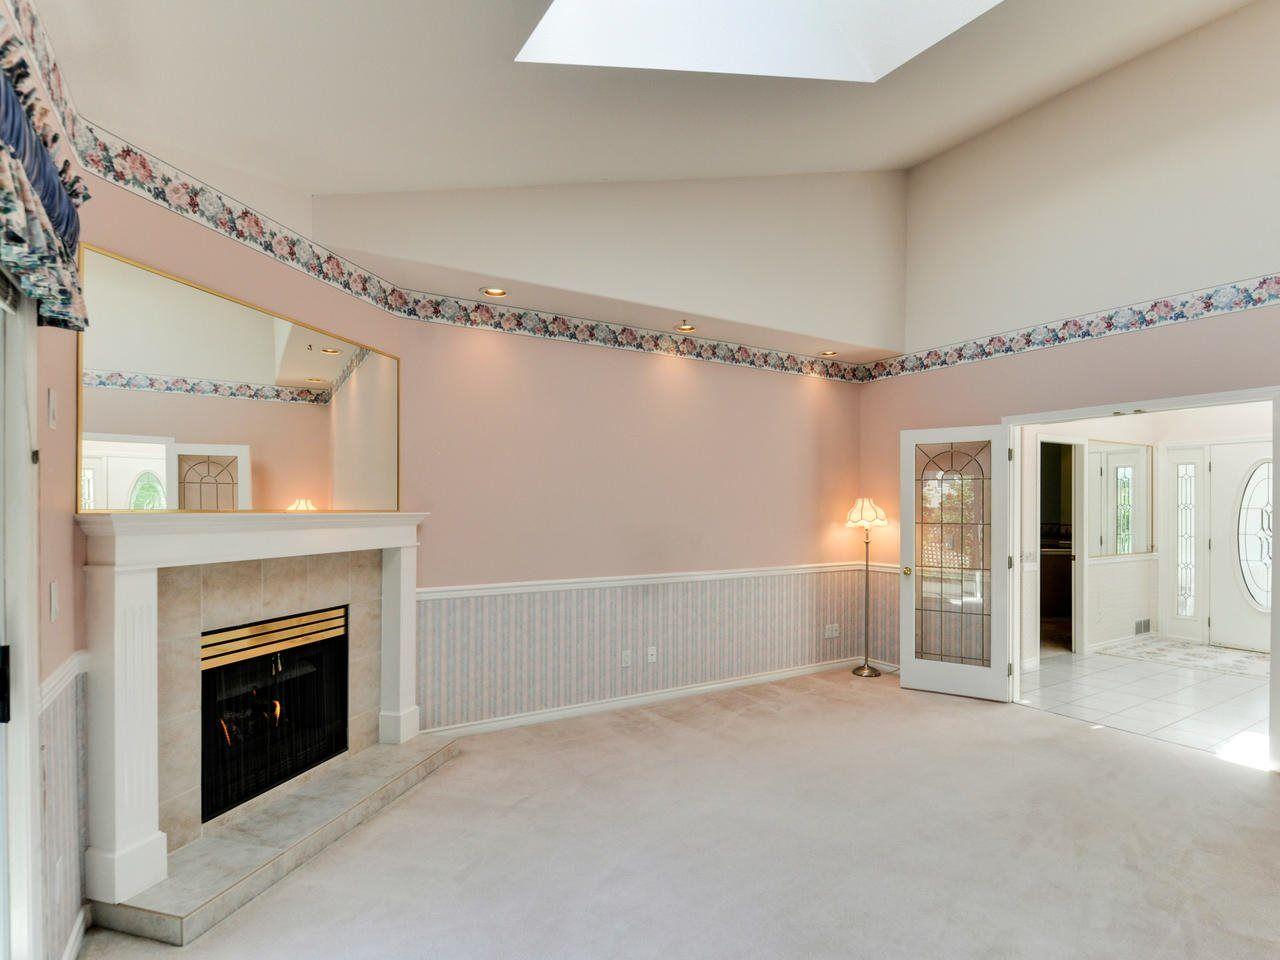 "Photo 10: Photos: 14923 24A Avenue in Surrey: Sunnyside Park Surrey House for sale in ""Sherborrke Estates"" (South Surrey White Rock)  : MLS®# R2374300"